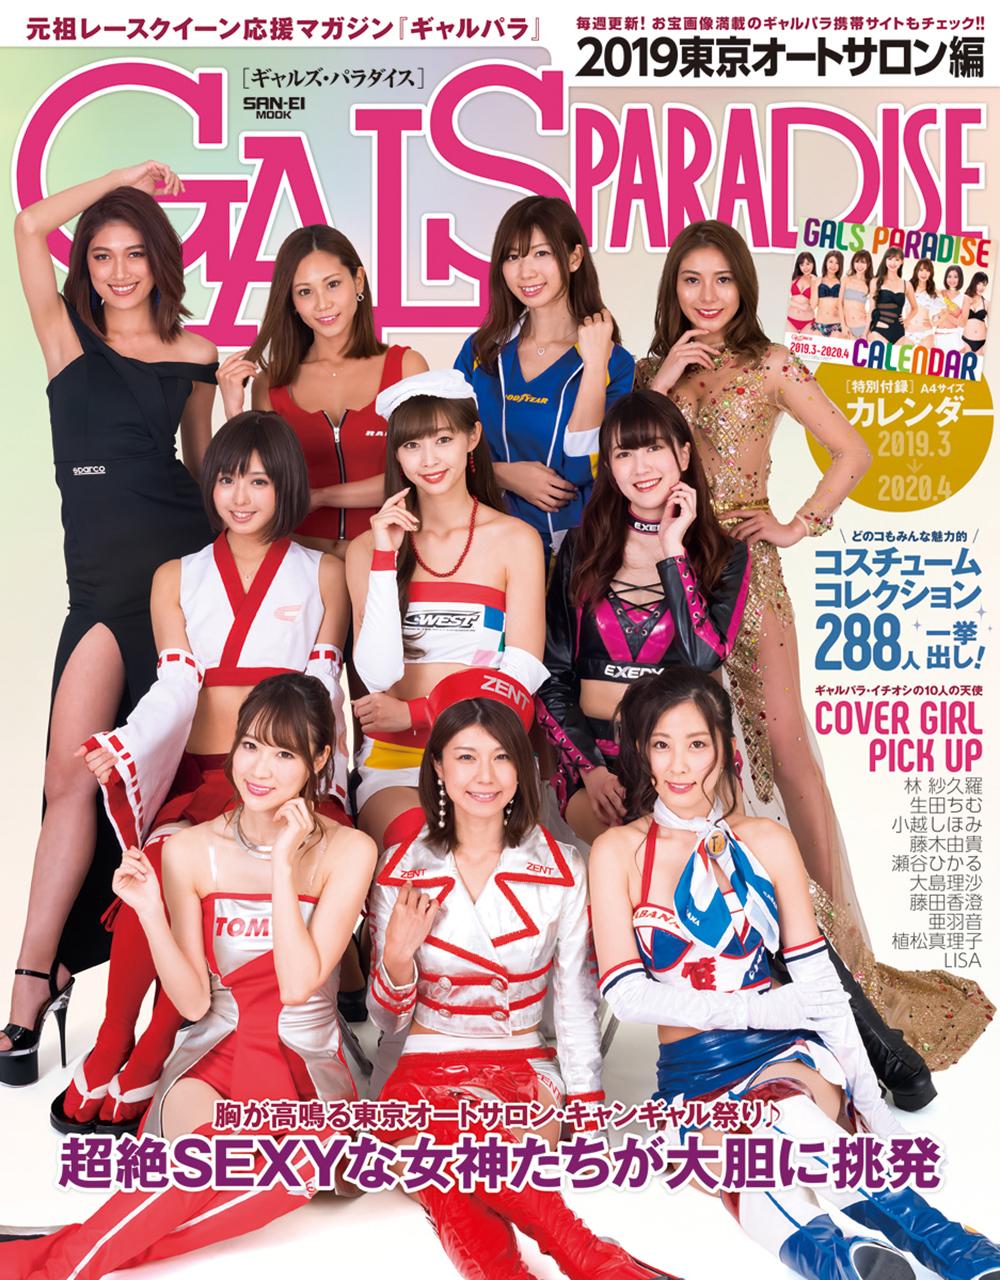 GALS PARADICE | GALS PARADISE 2019 東京オートサロン編